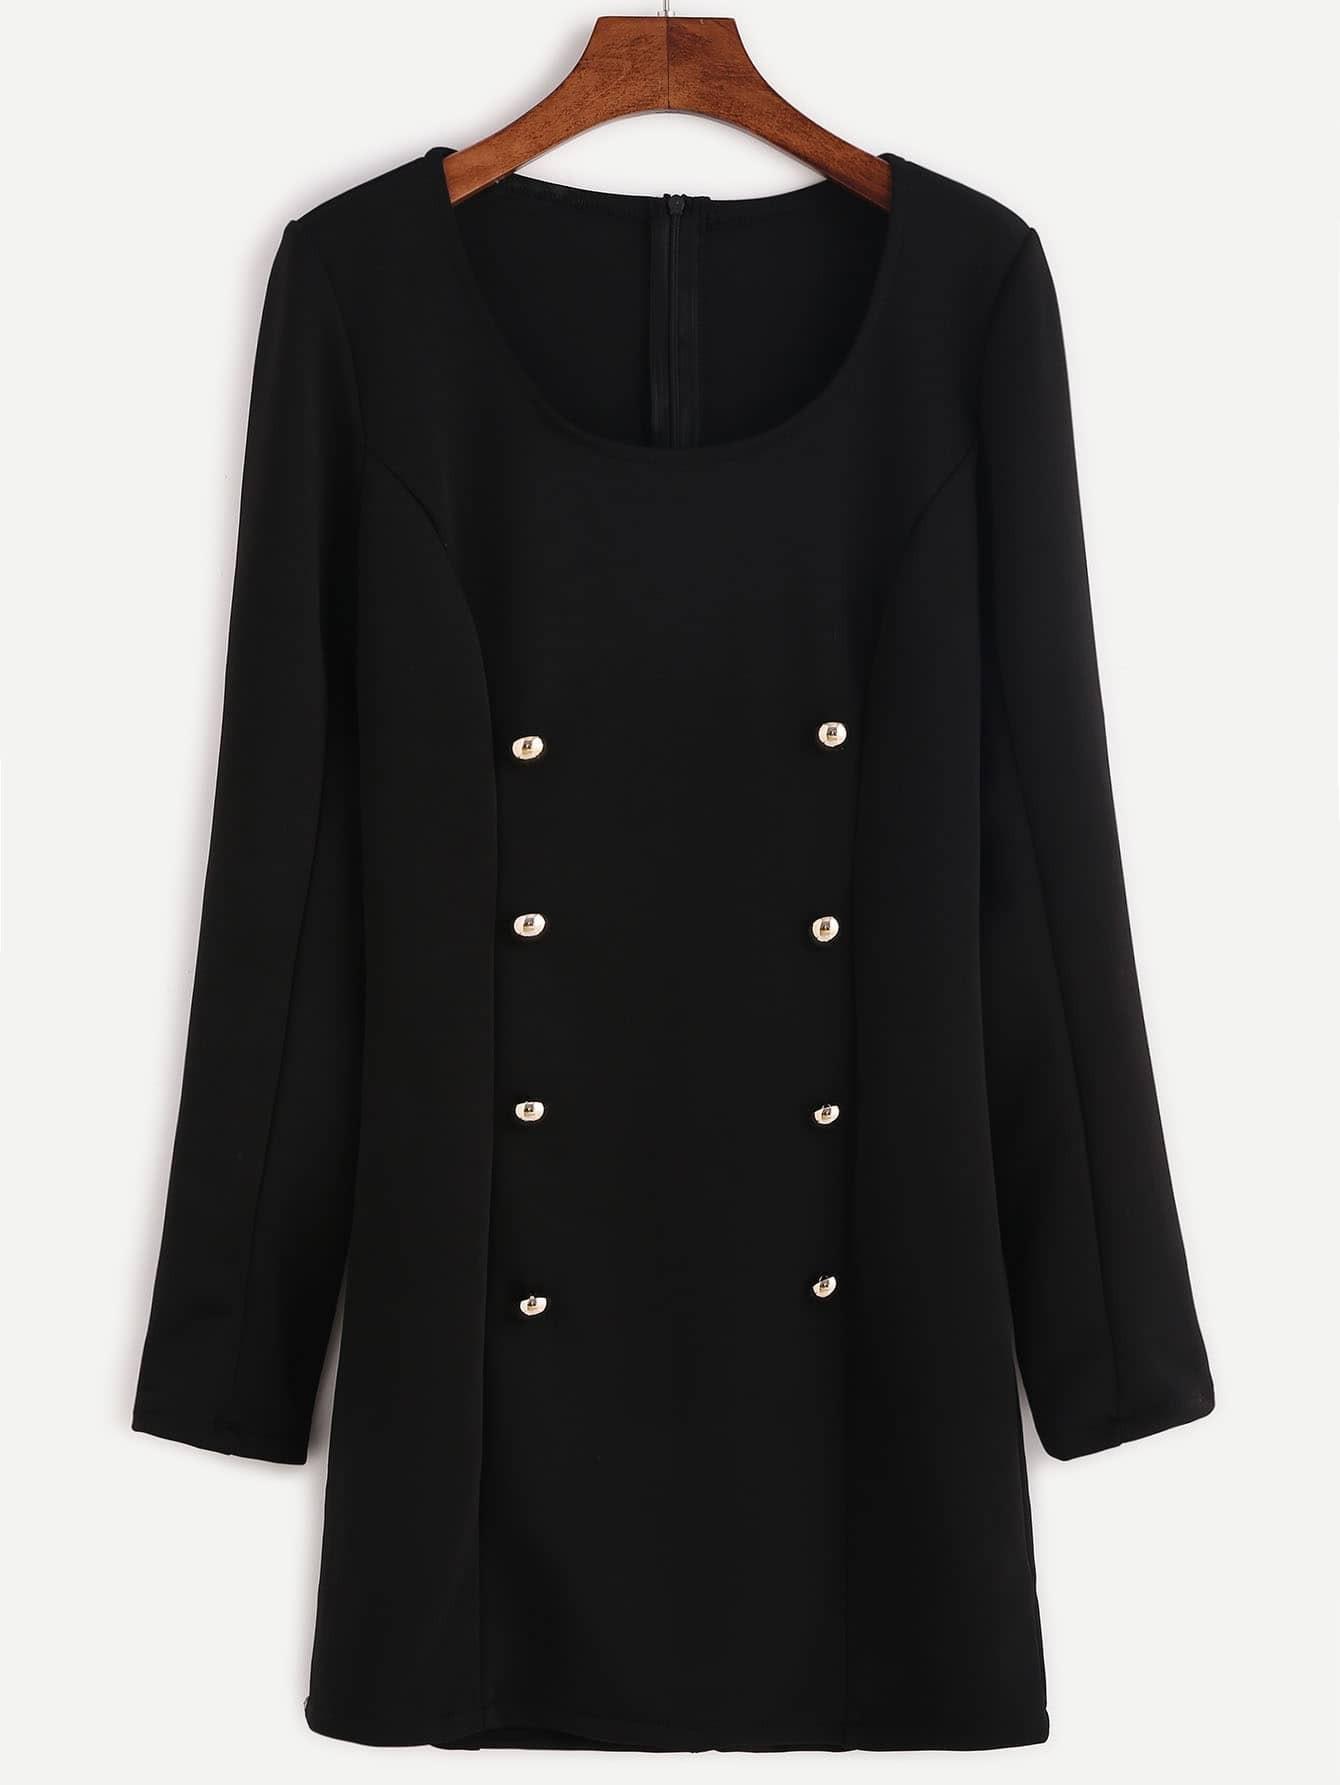 Black Double Breasted Zipper Back Sheath DressBlack Double Breasted Zipper Back Sheath Dress<br><br>color: Black<br>size: L,M,S,XL